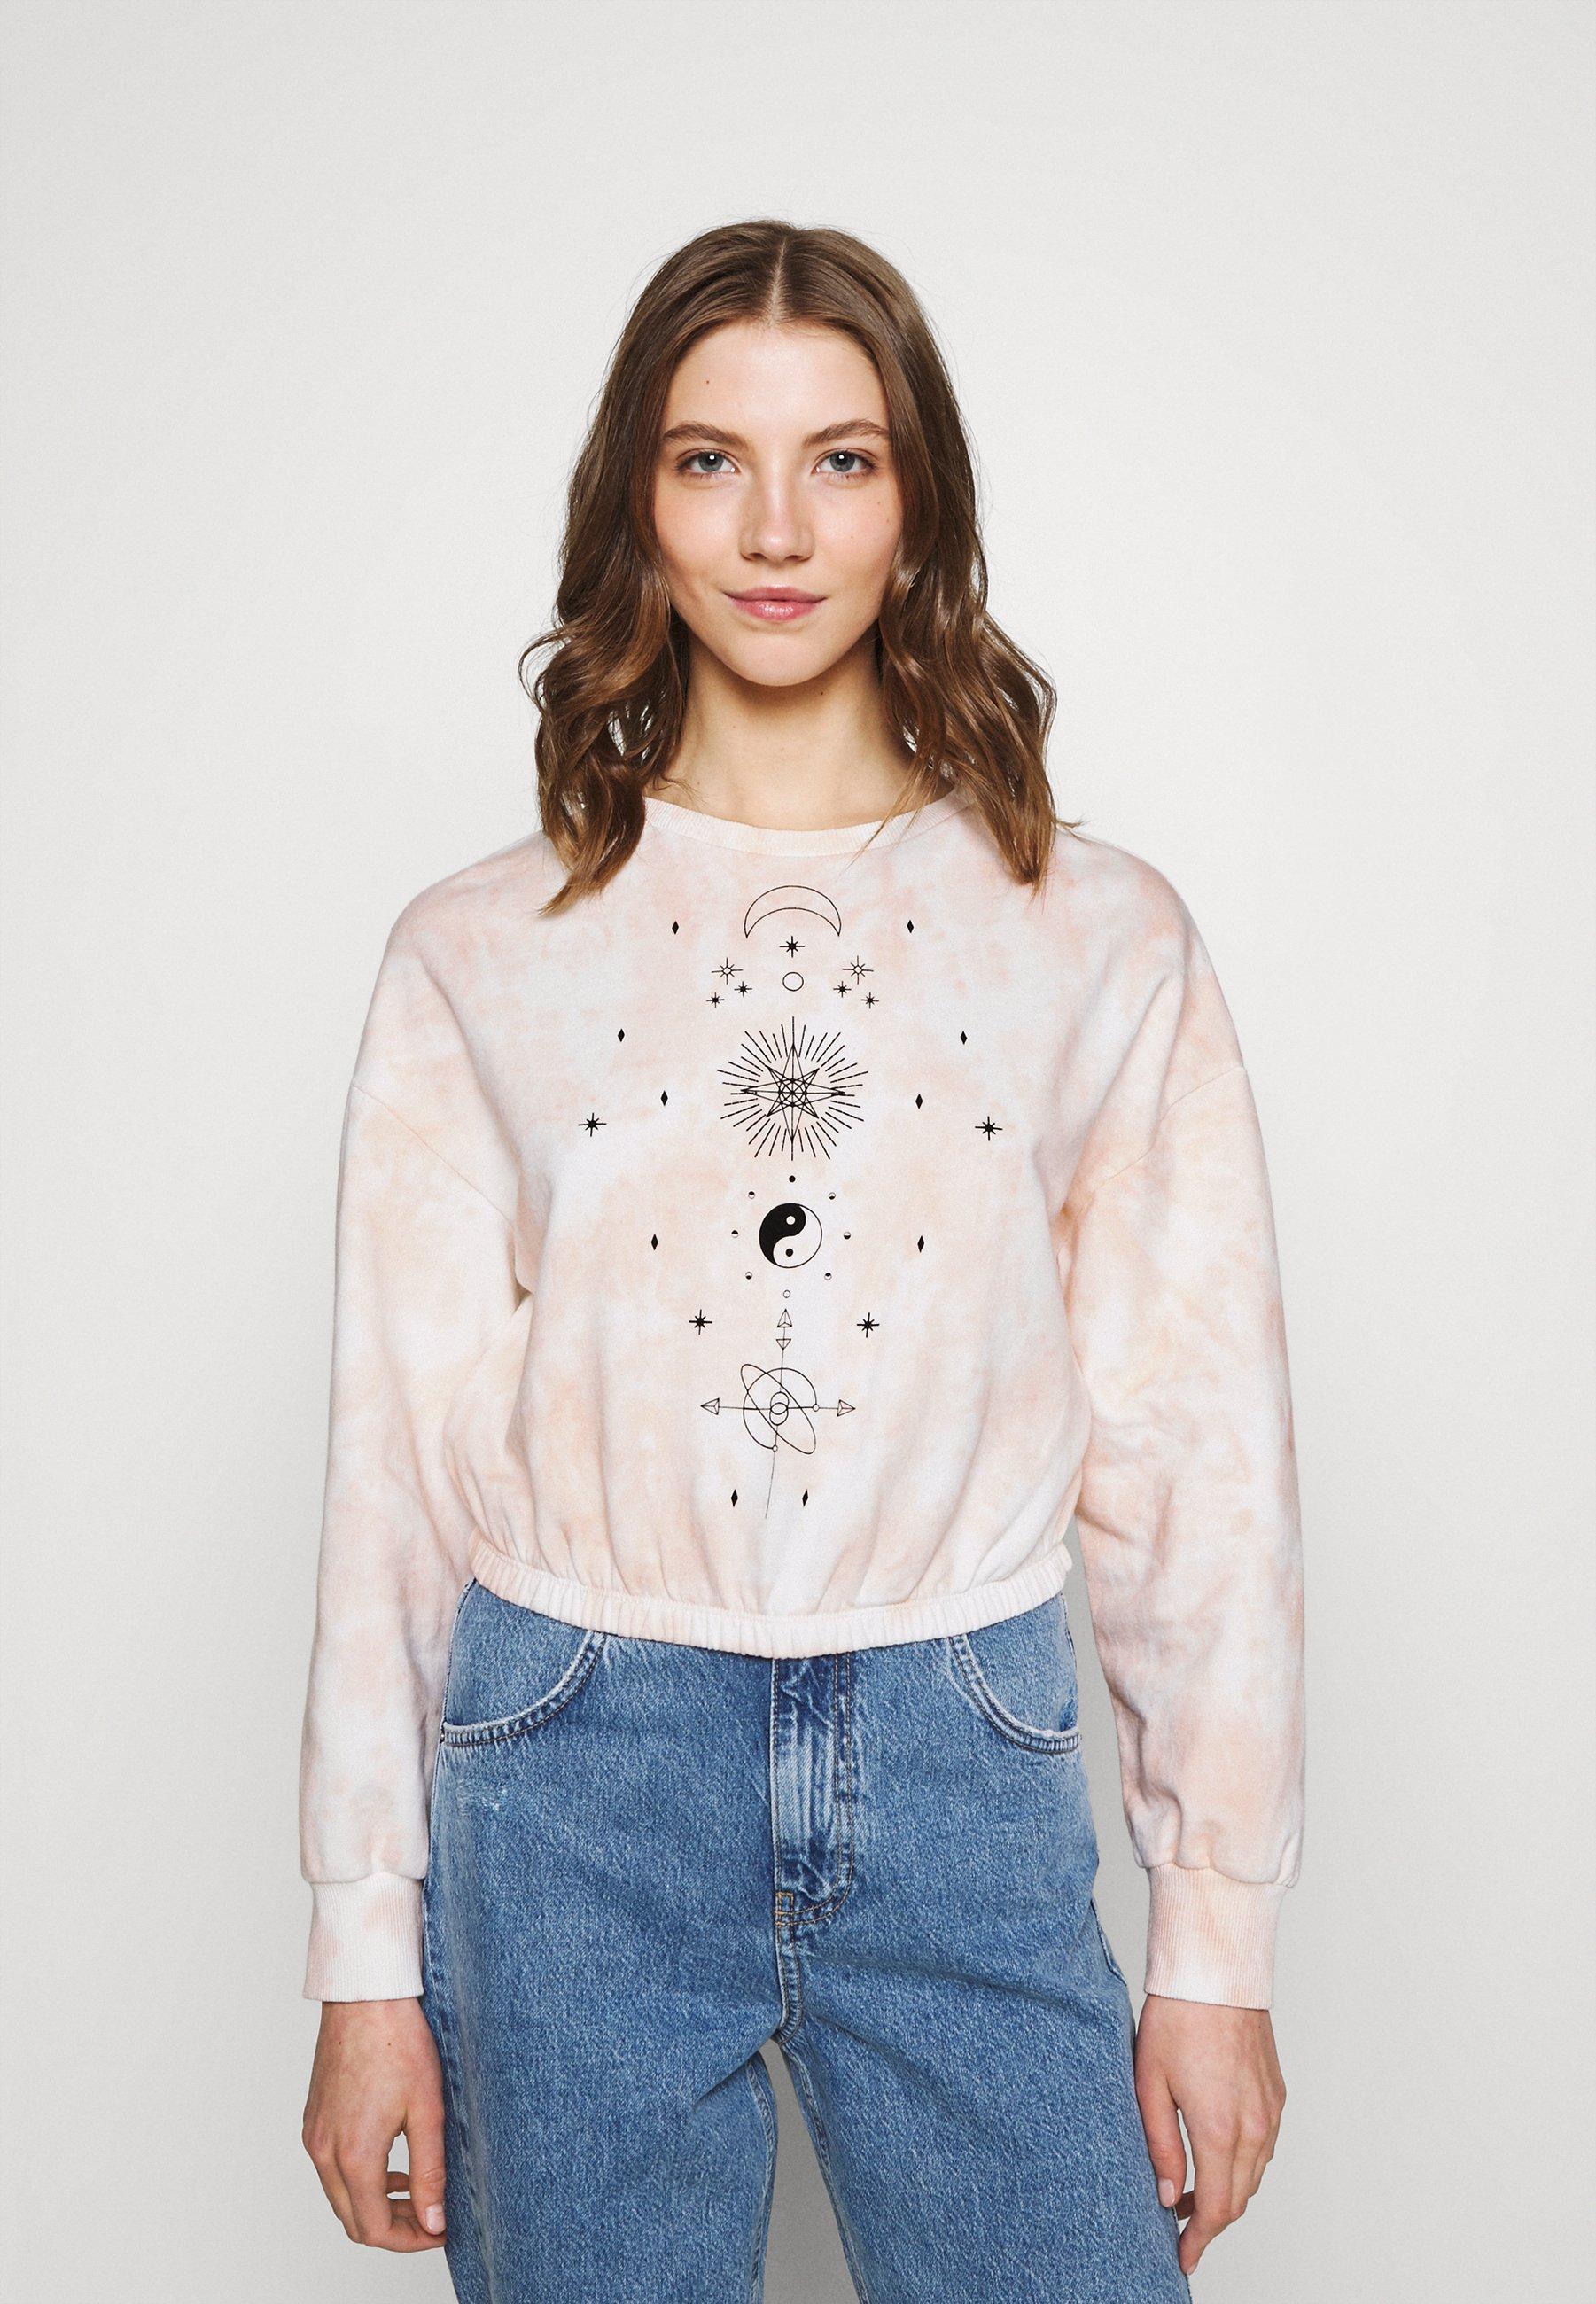 Women Tie Dye Printed Cropped Sweatshirt - Sweatshirt